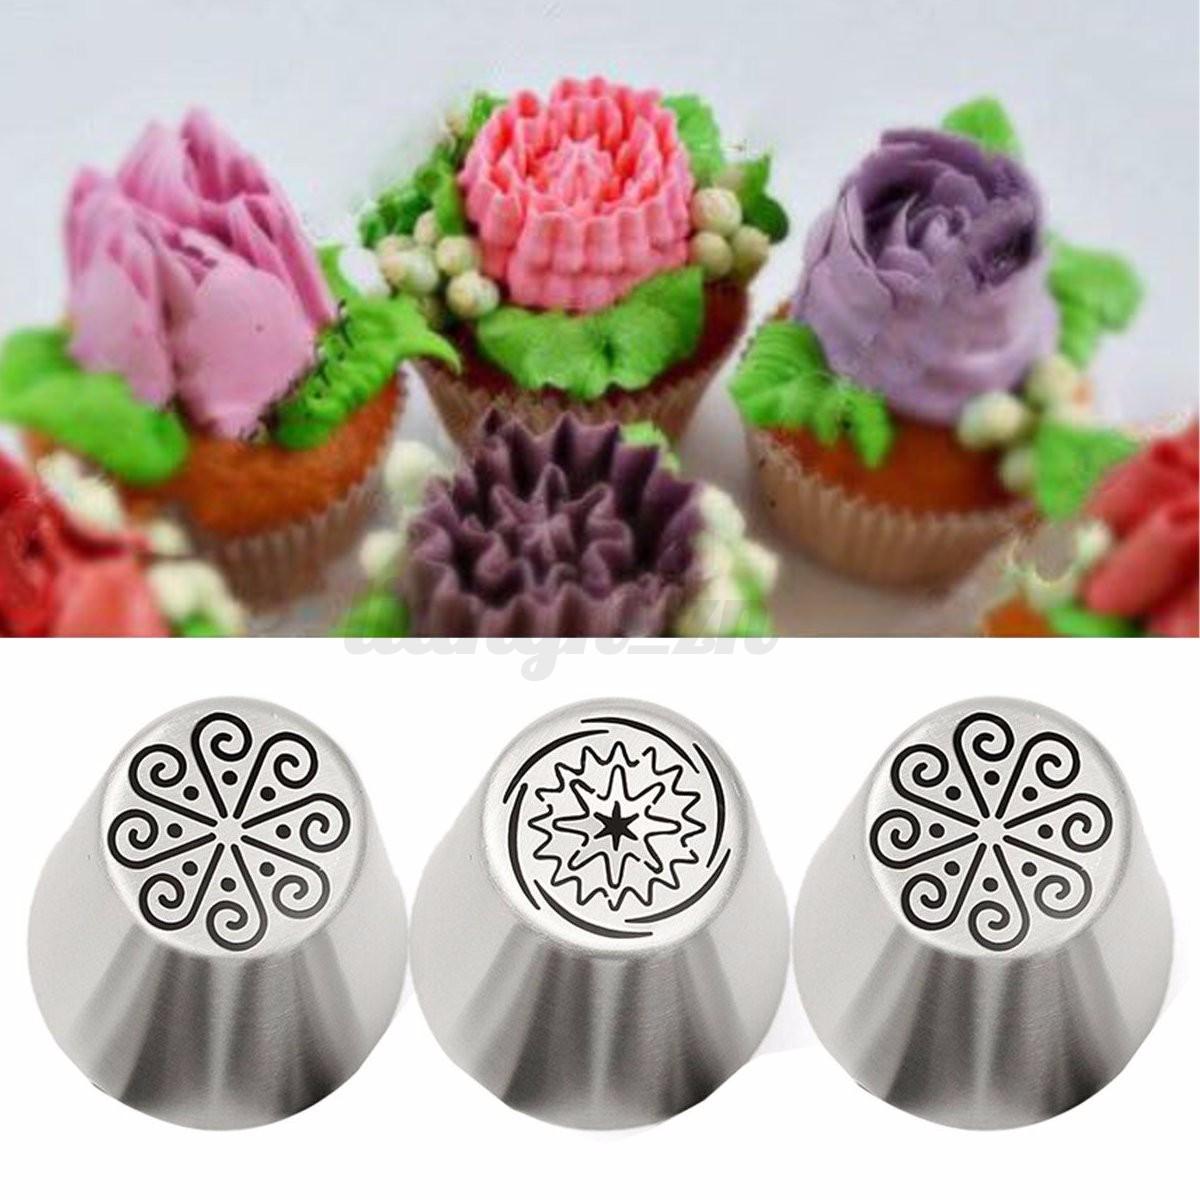 douille g teau patisserie glace cr me fleur russe tulipe tuyauterie nozzle buse ebay. Black Bedroom Furniture Sets. Home Design Ideas